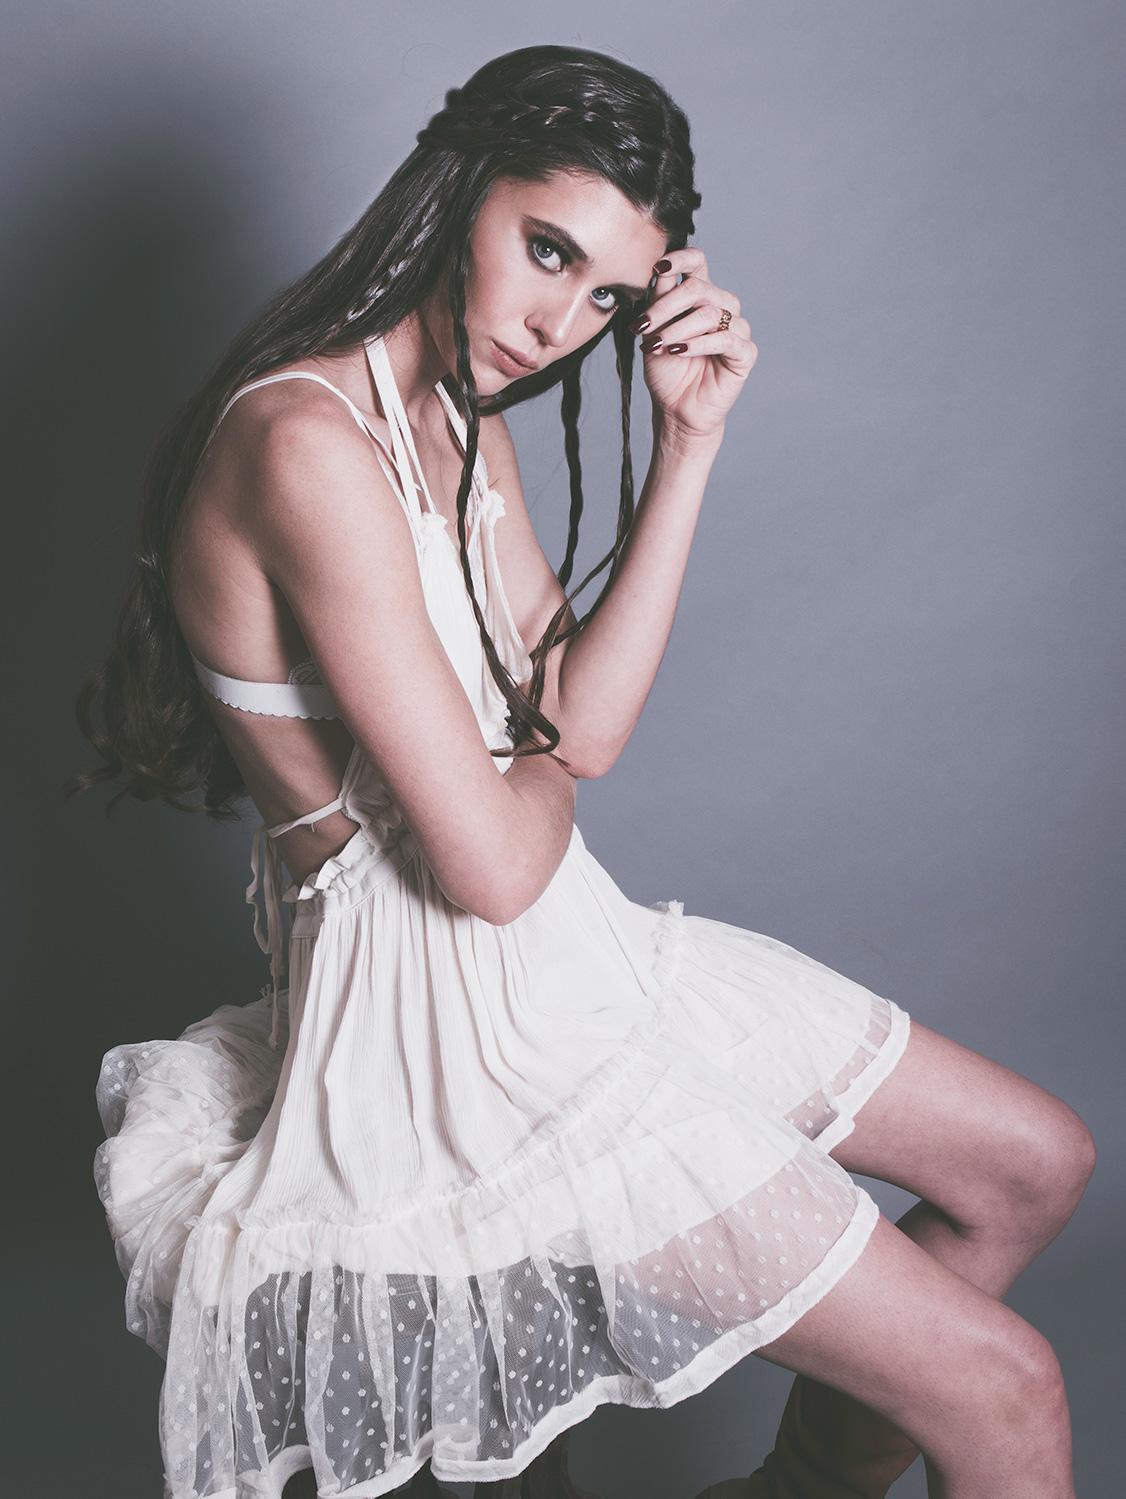 amora_beauty_studio_female_model_sitting_chair_white_dress_indie_rock__braids_miami.jpg